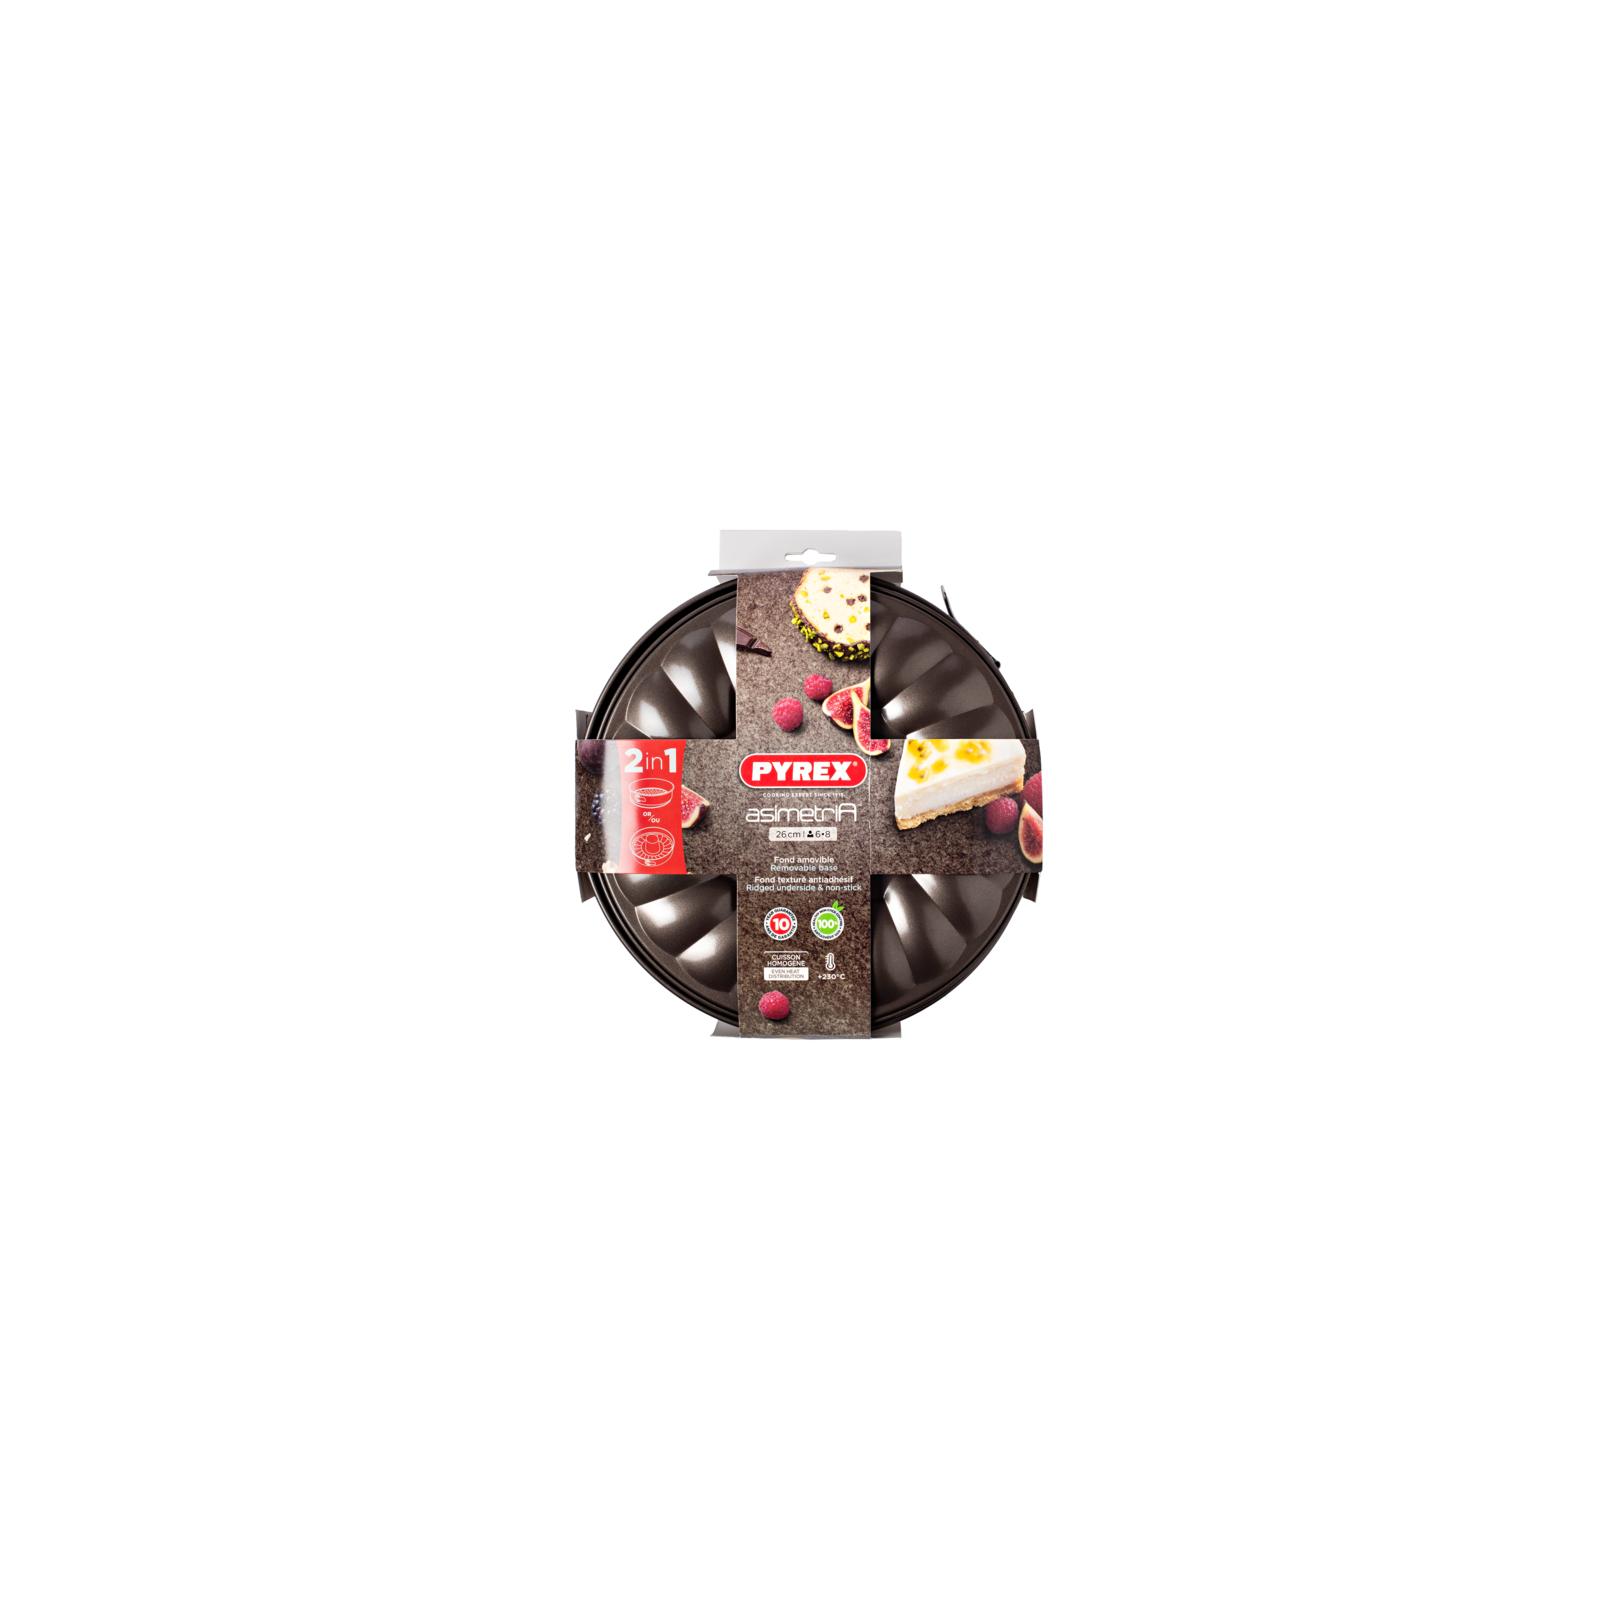 Форма для выпечки Pyrex Asimetria разъемная 26 см (AS26DT0)